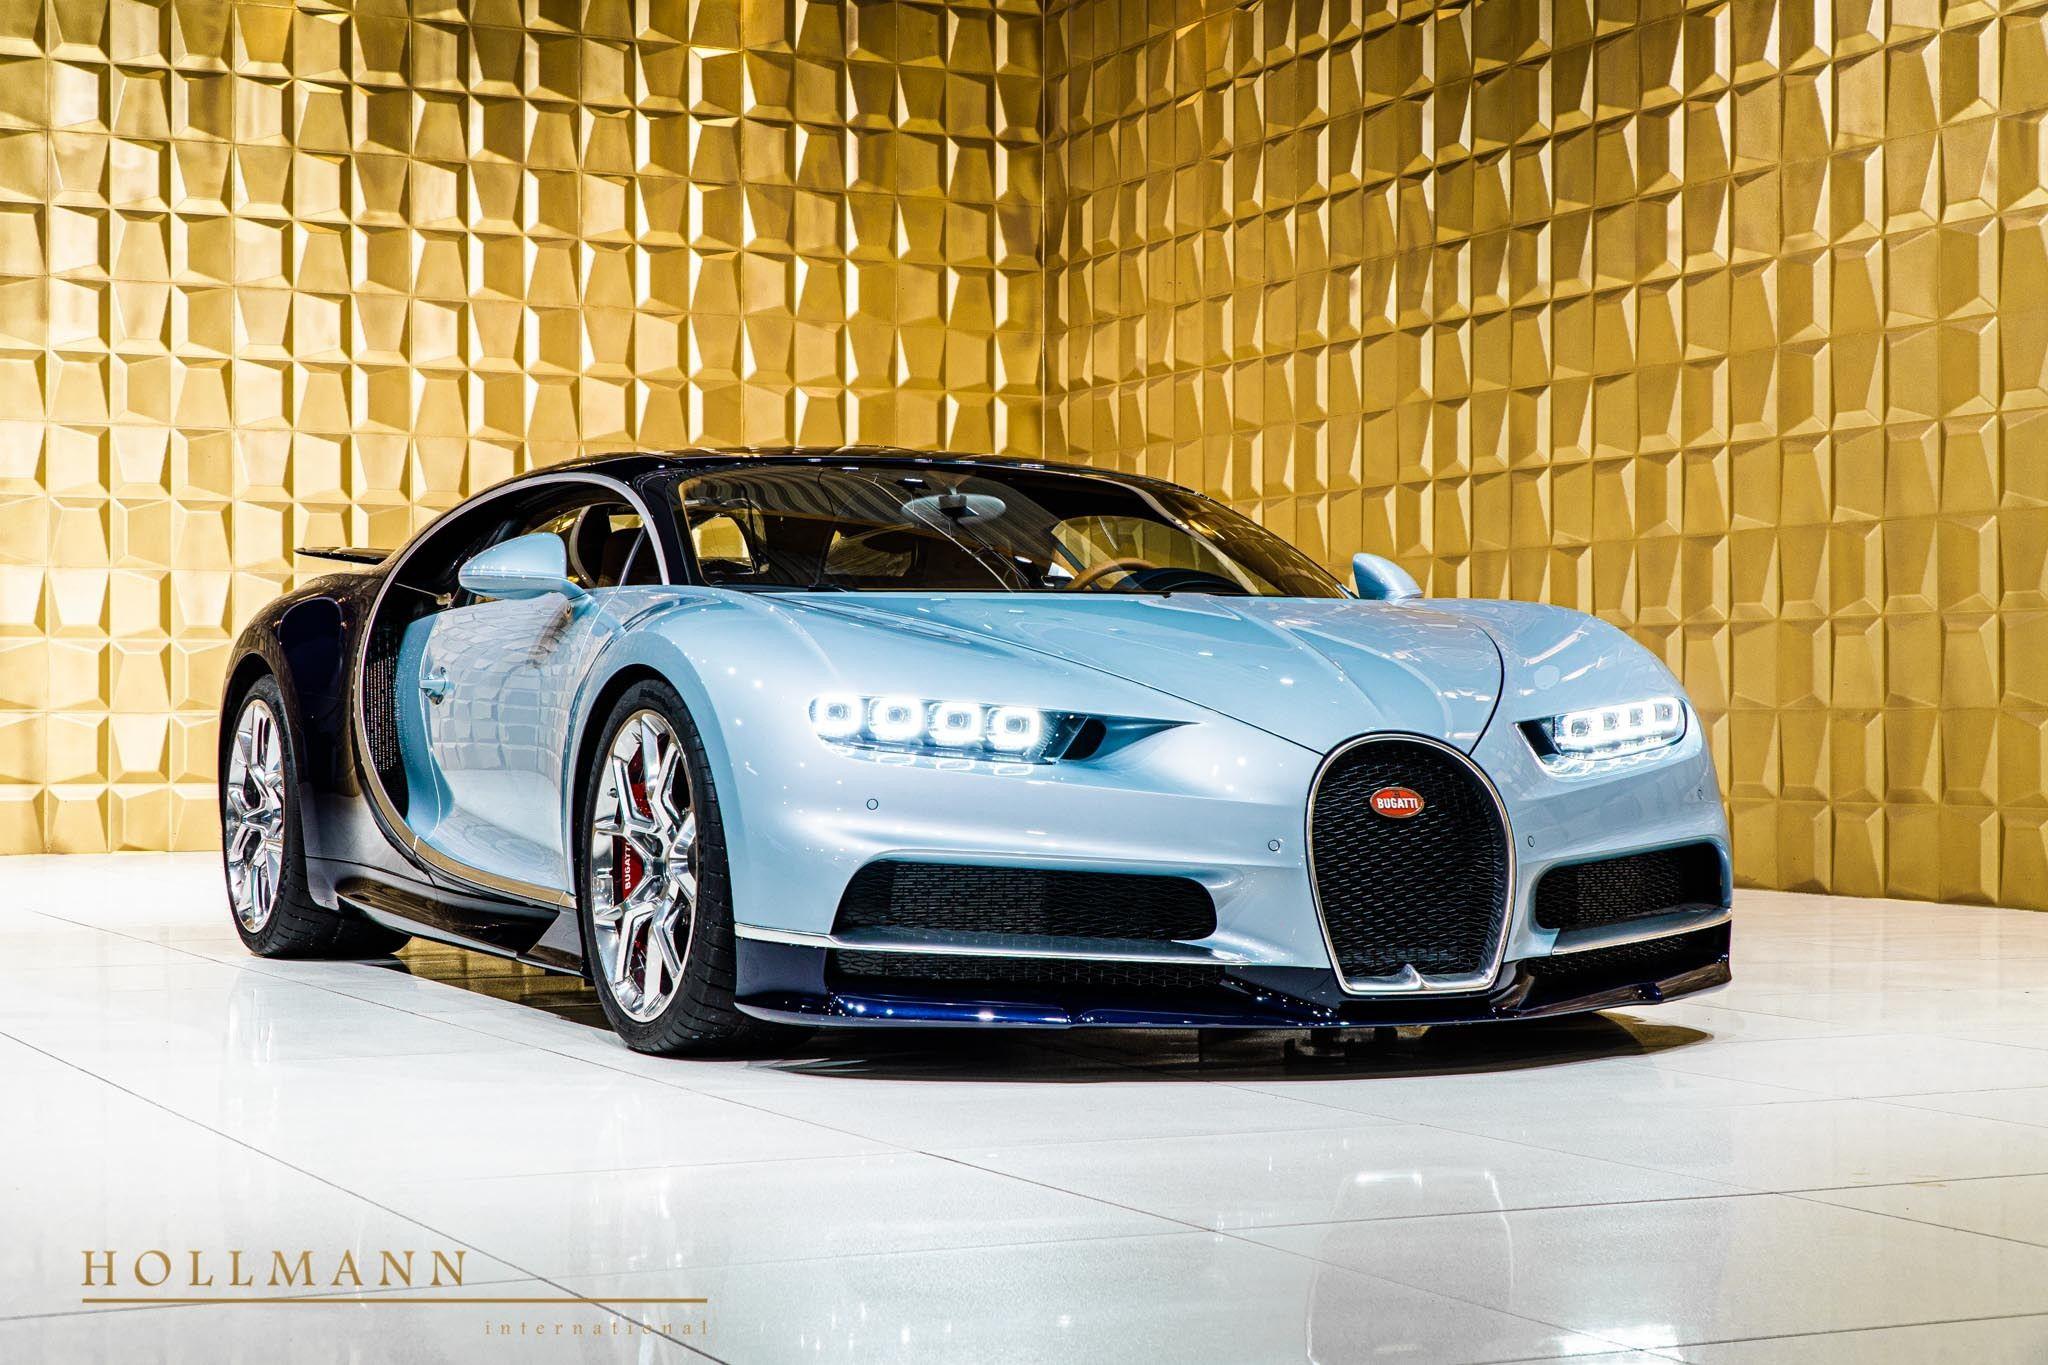 Bugatti Chiron Hollmann International Germany For Sale On Luxurypulse Bugatti Chiron Bugatti Bugatti Cars